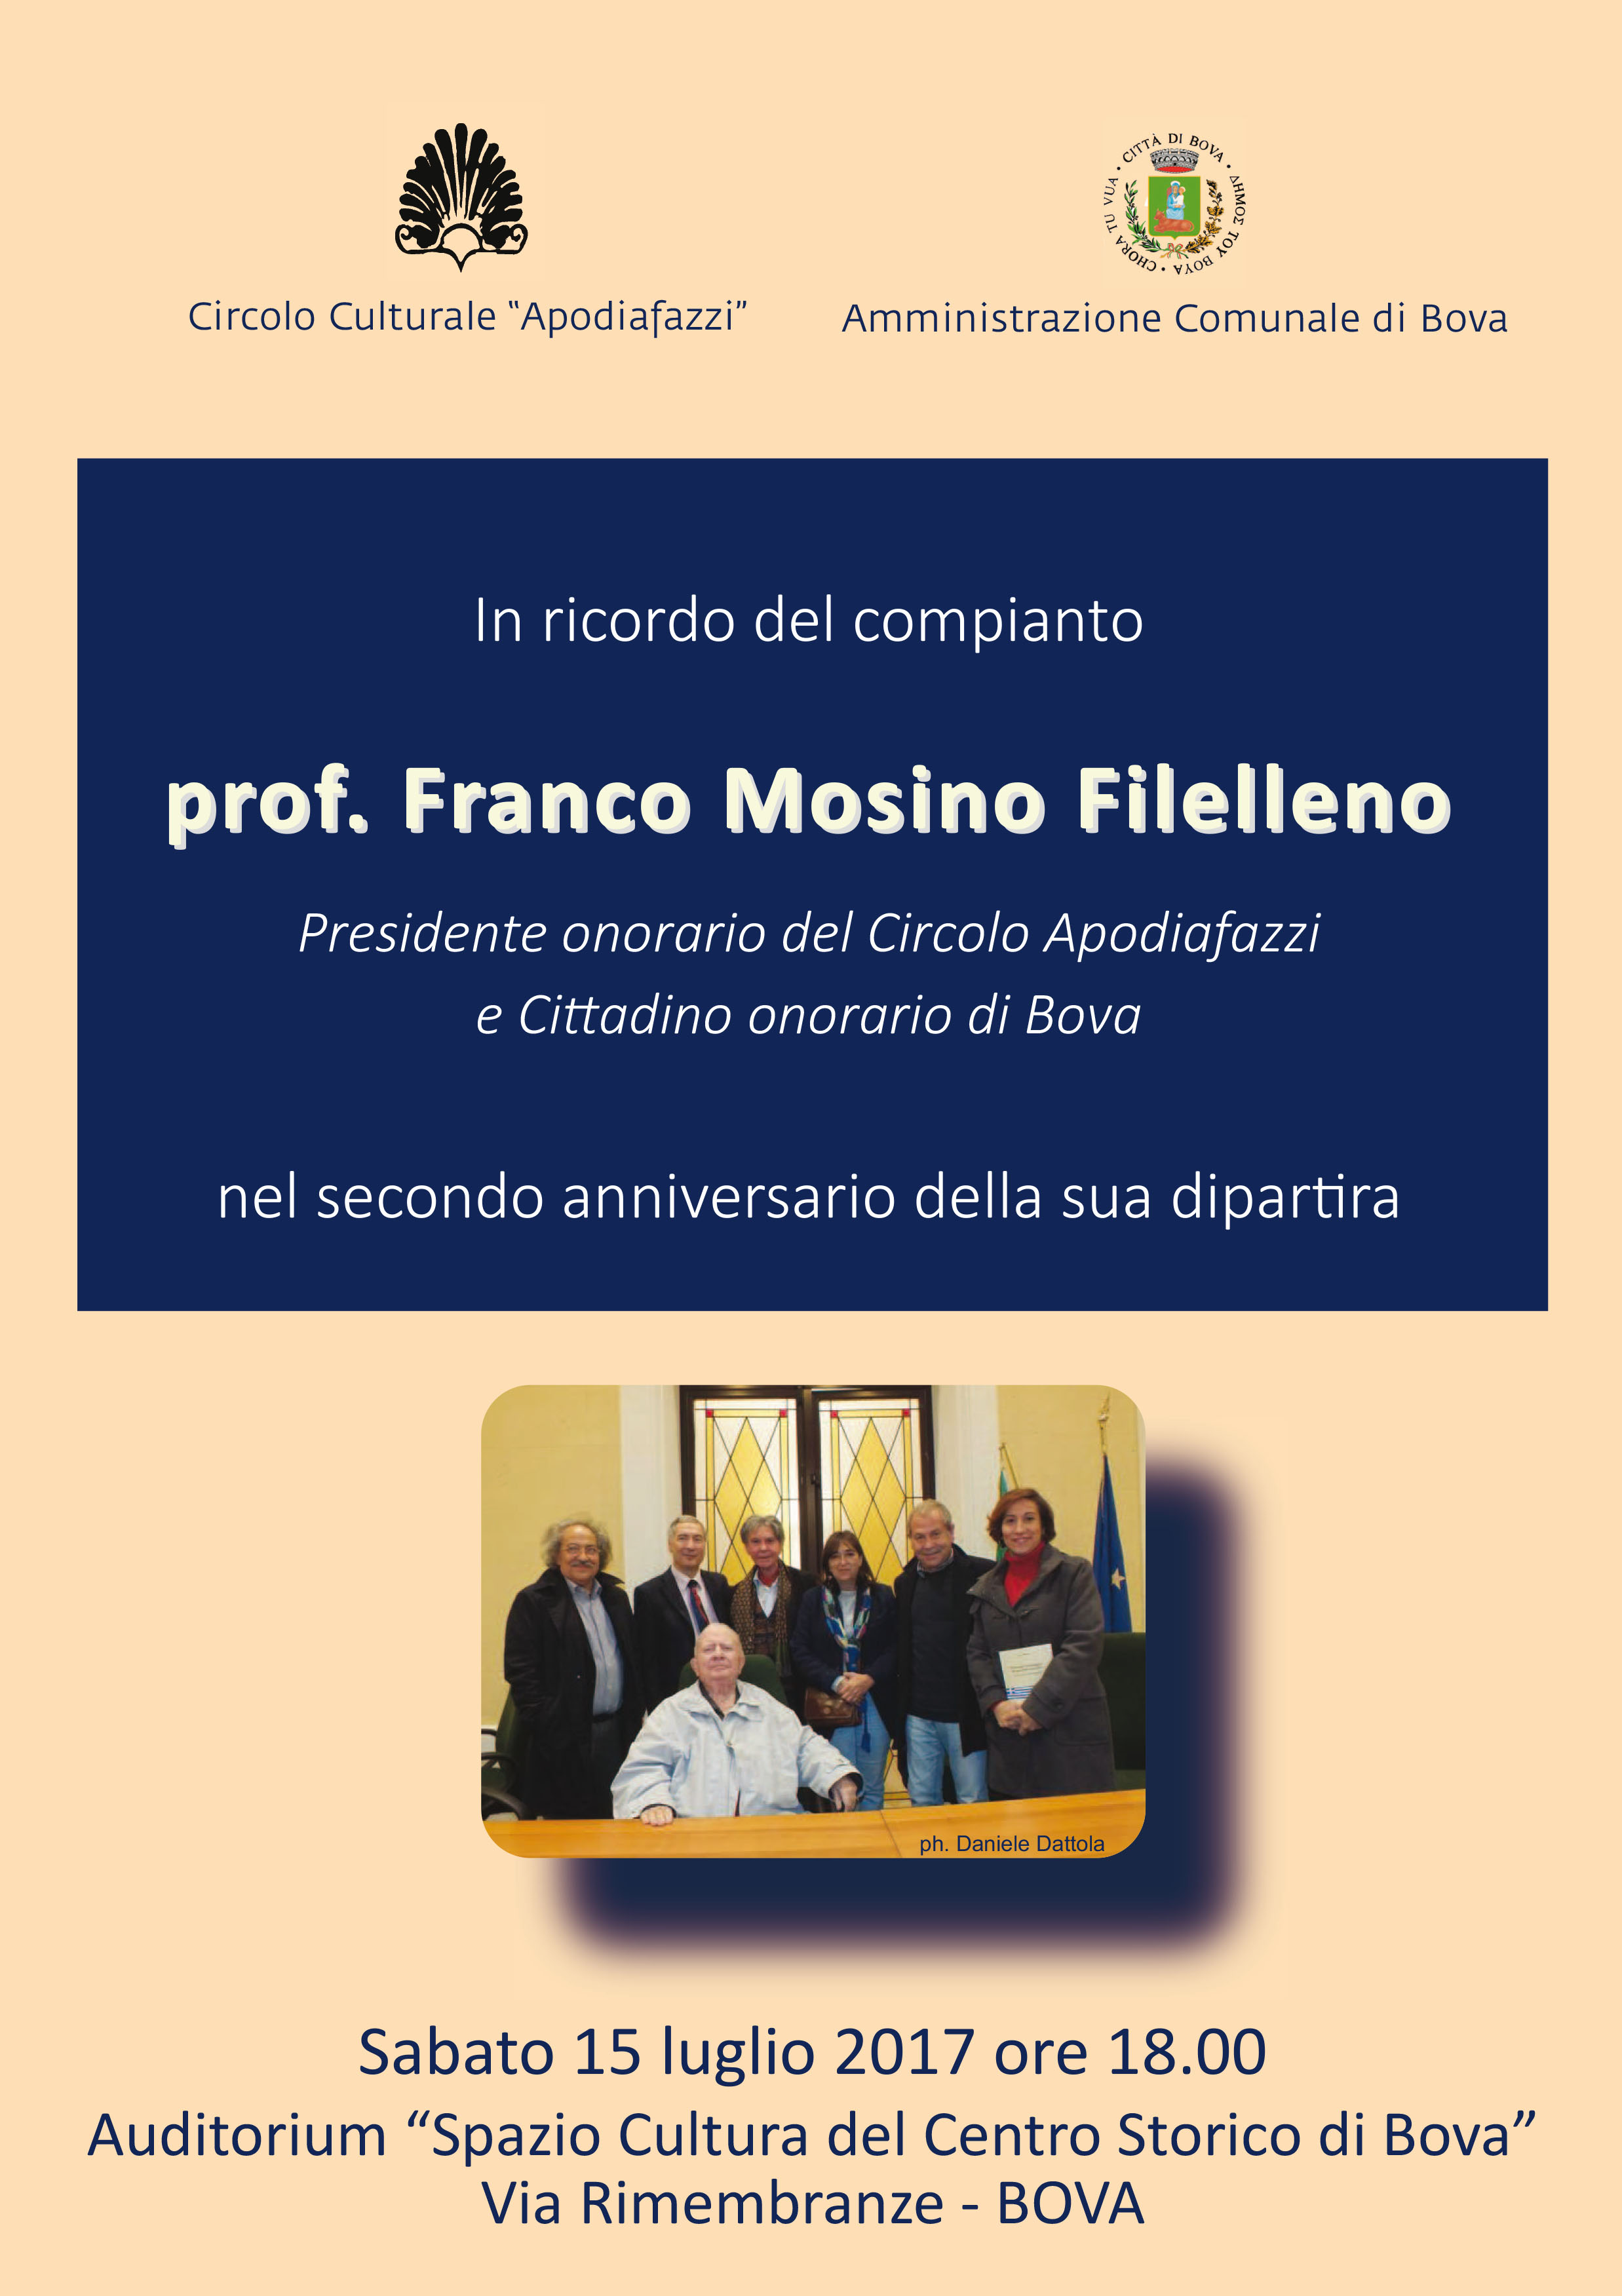 Locandina secondo anniversario Mosino